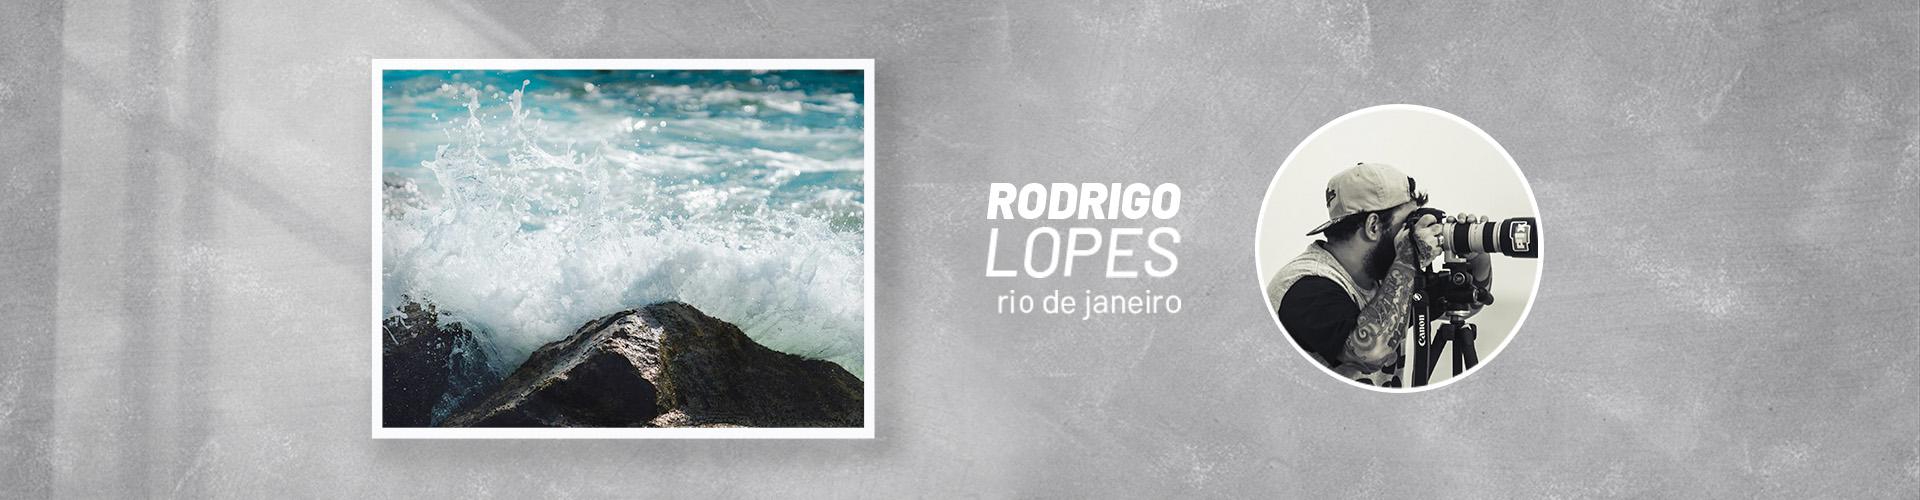 Página Artista | Rodrigo Lopes